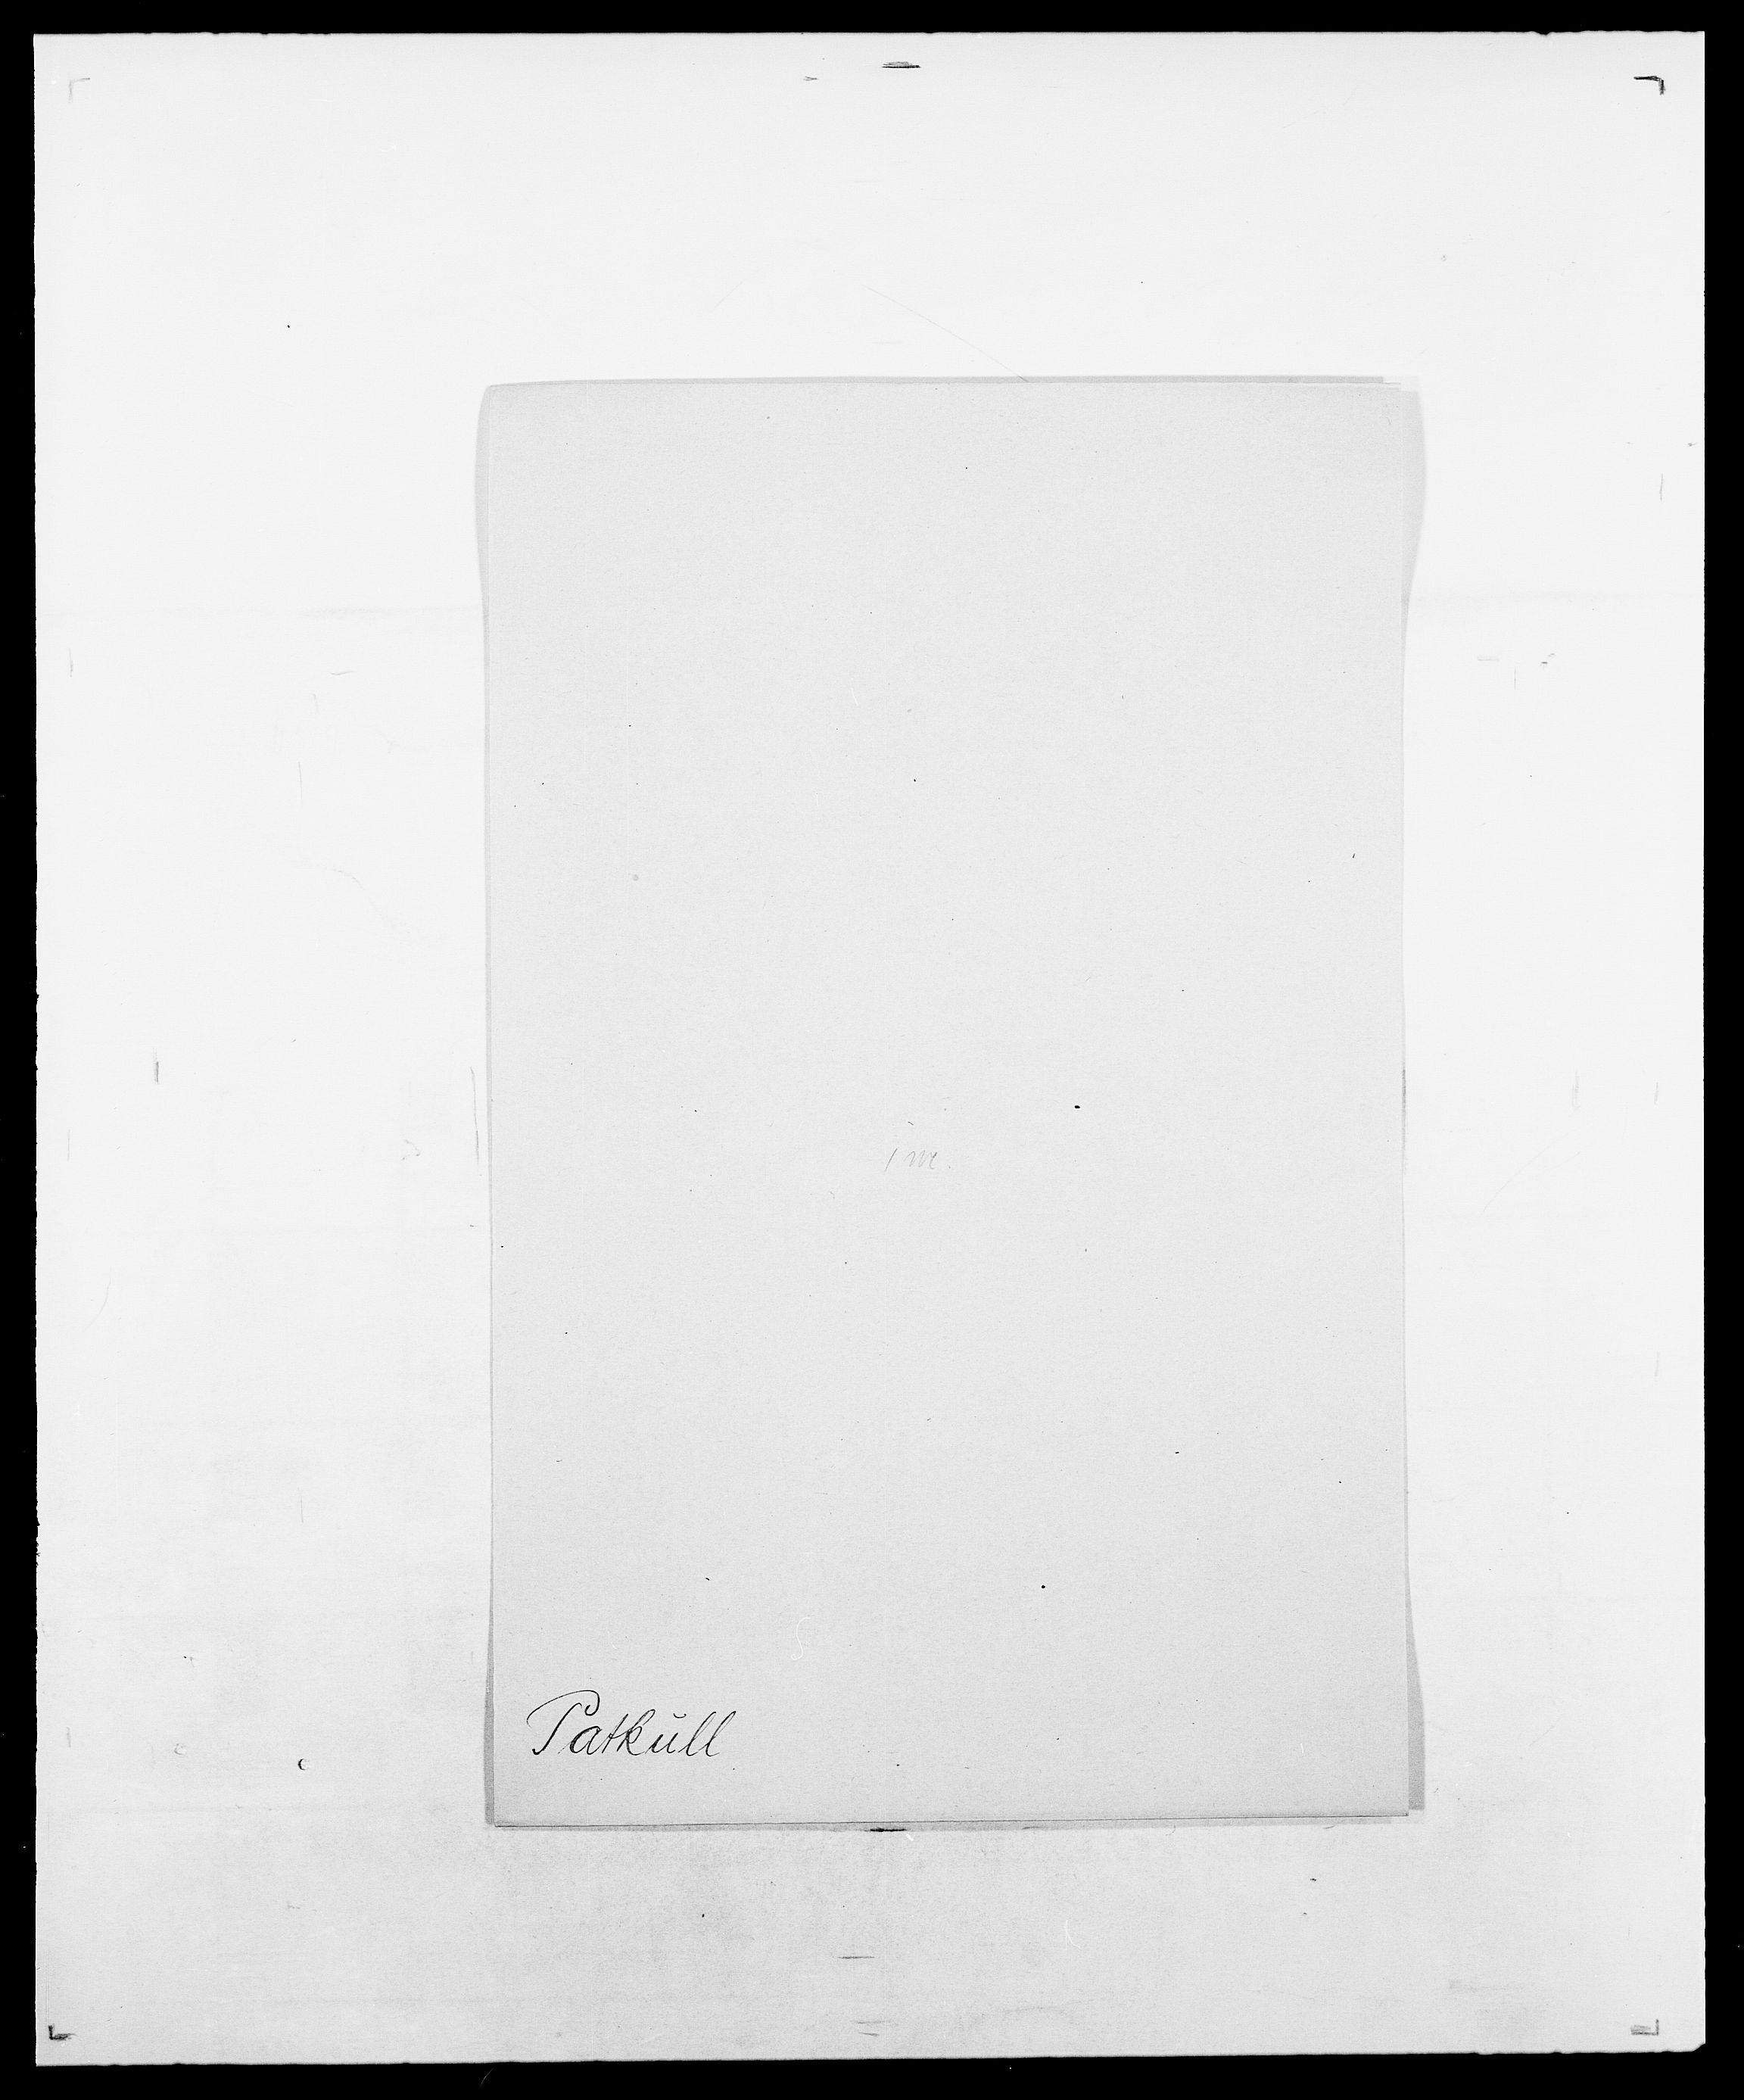 SAO, Delgobe, Charles Antoine - samling, D/Da/L0030: Paars - Pittelkov, s. 149